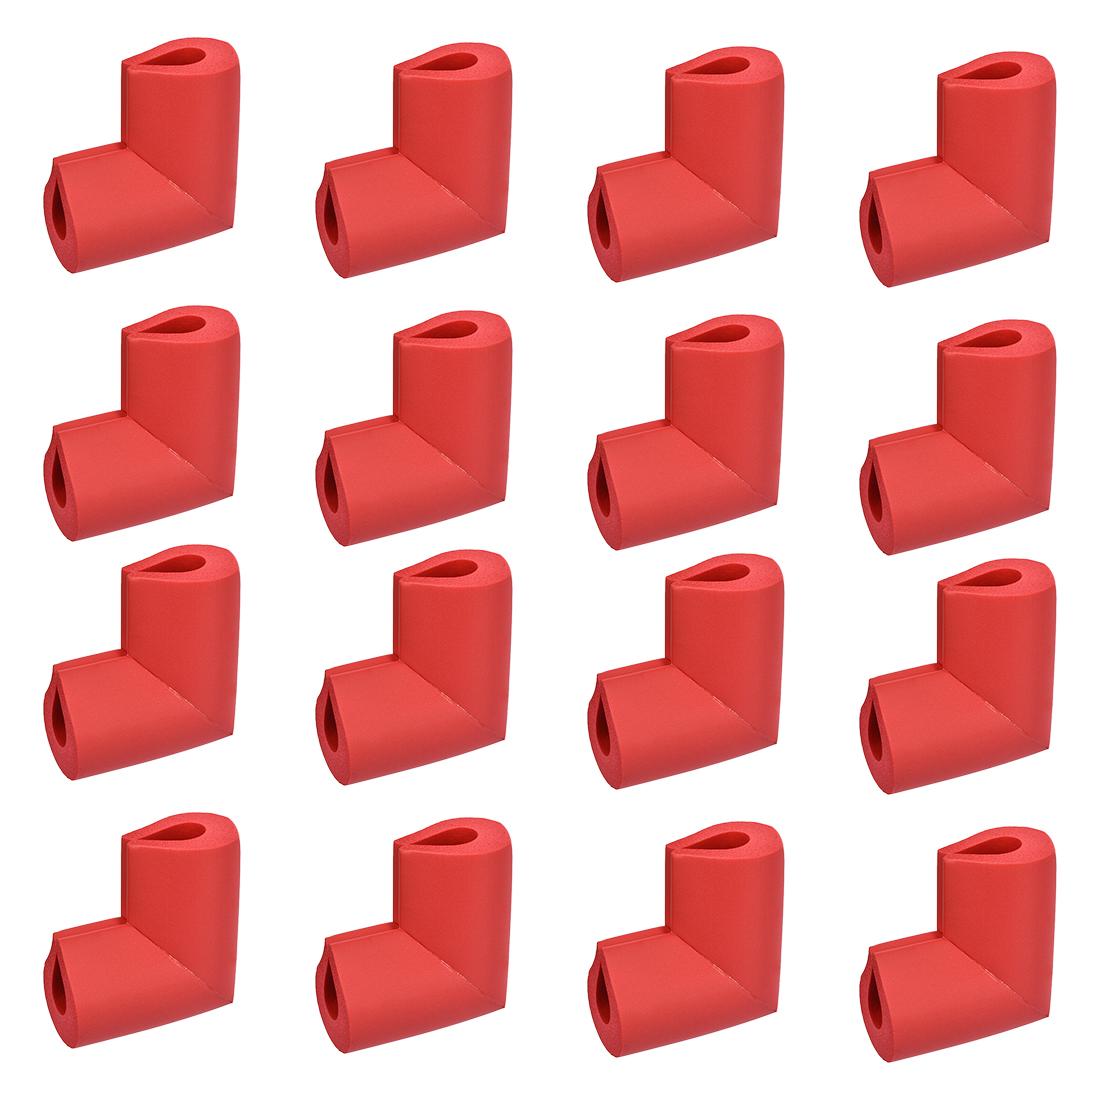 Corners Table Edge Guard U Shaped Angle Corner Guards 50 x 38 x 8mm Red 16pcs